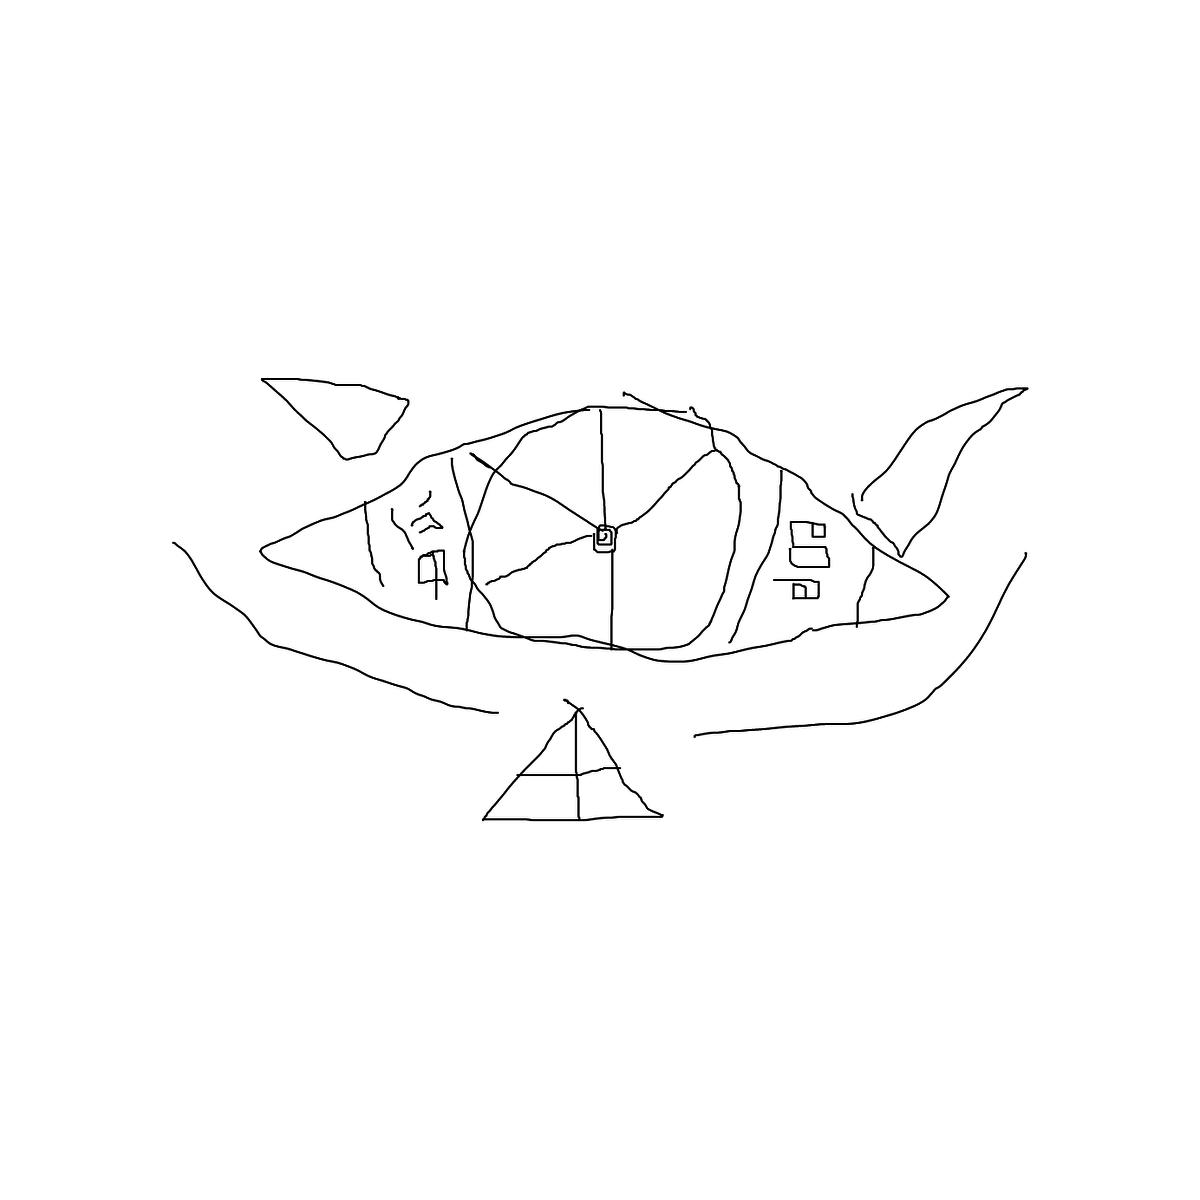 BAAAM drawing#2123 lat:1.5379012823104858lng: 171.3867187500000000